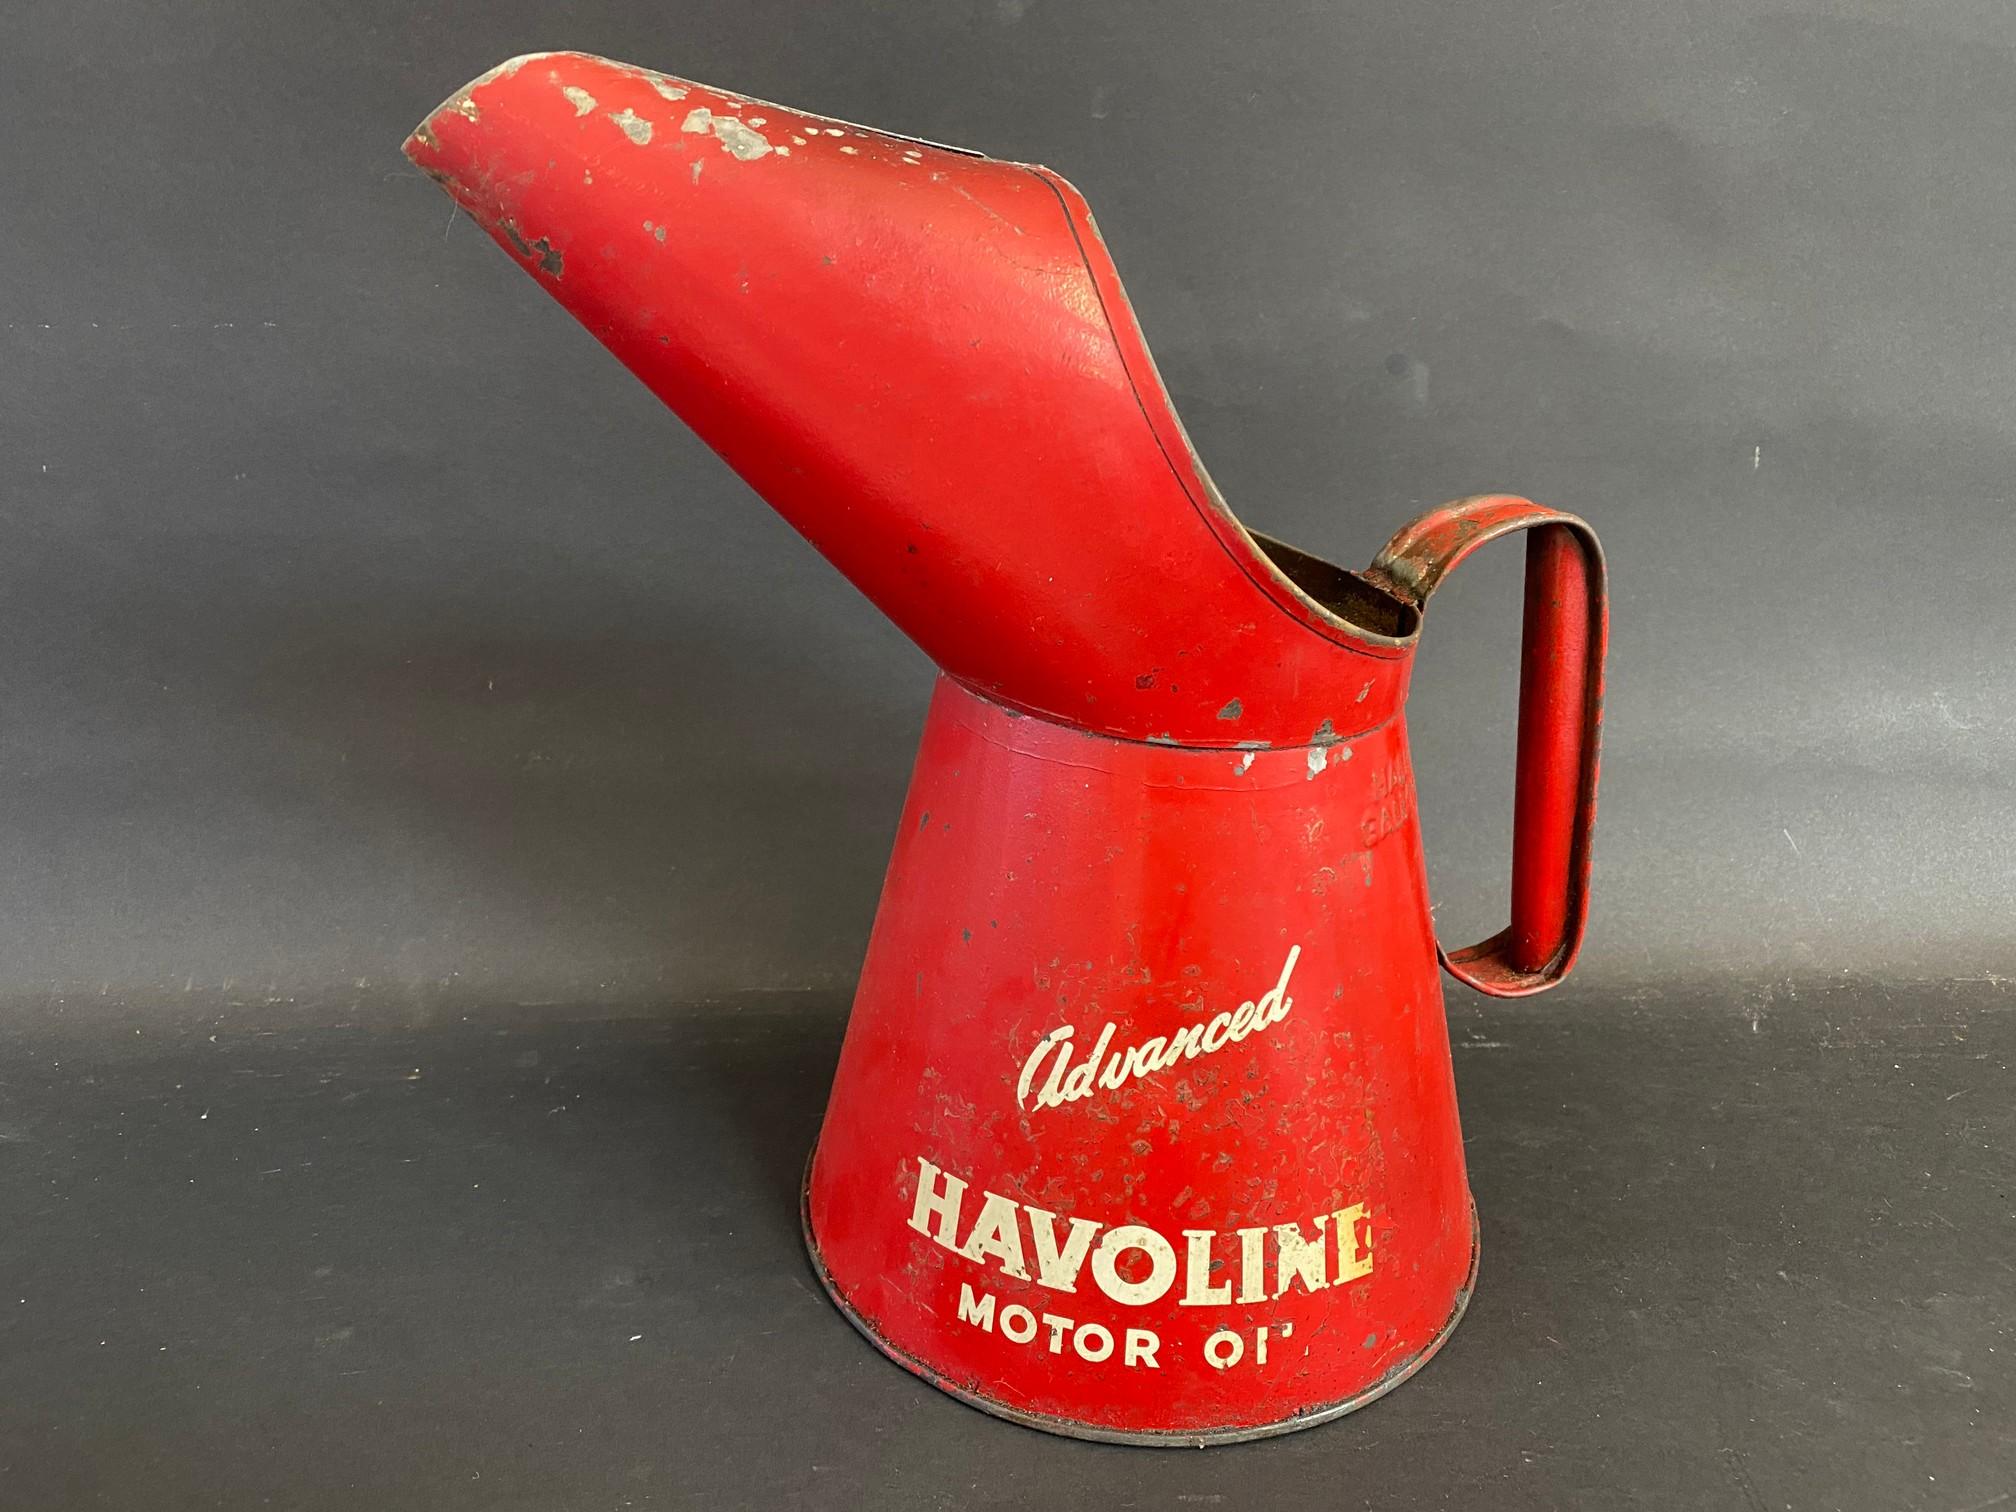 A Havoline Motor Oil half gallon measure.